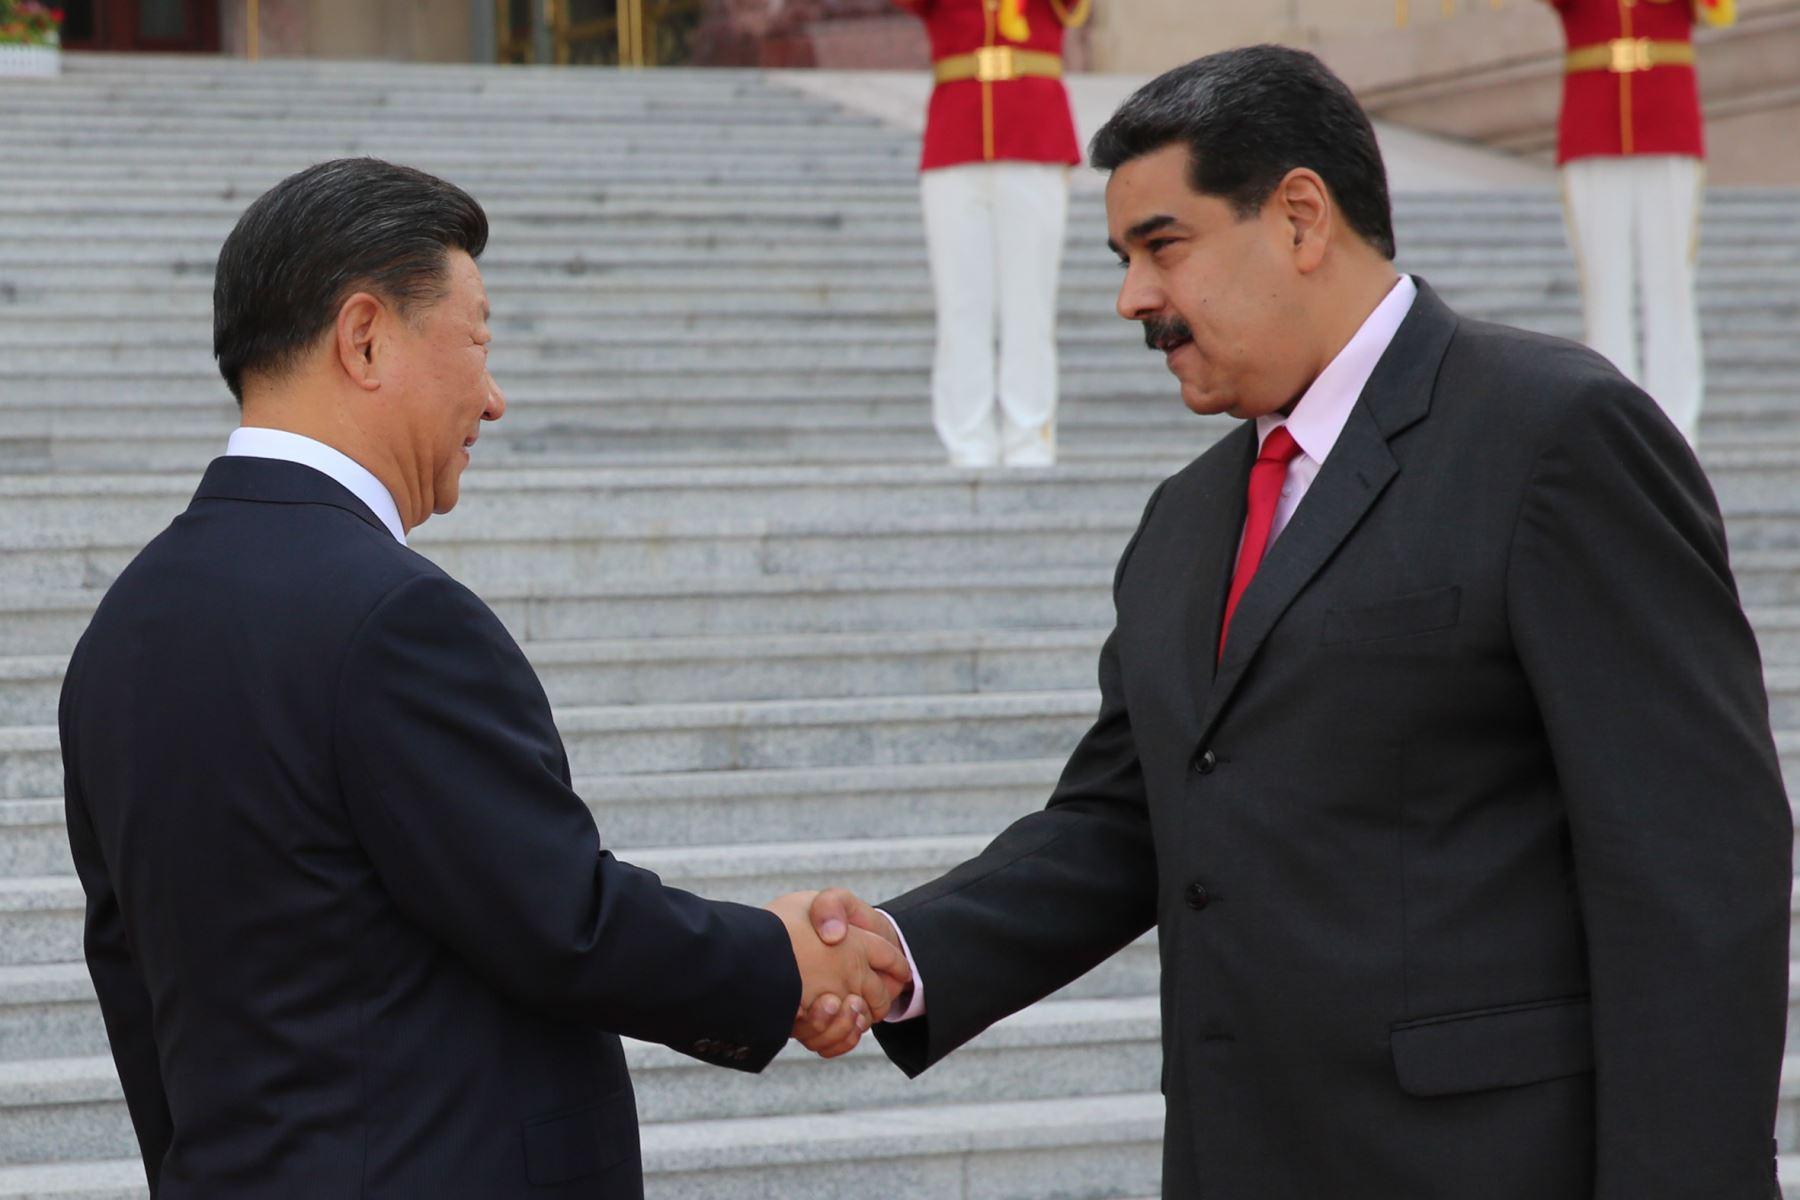 Presidente venezolano Nicolas Maduro estrechando la mano de su homólogo chino Xi Jinping Foto: AFP